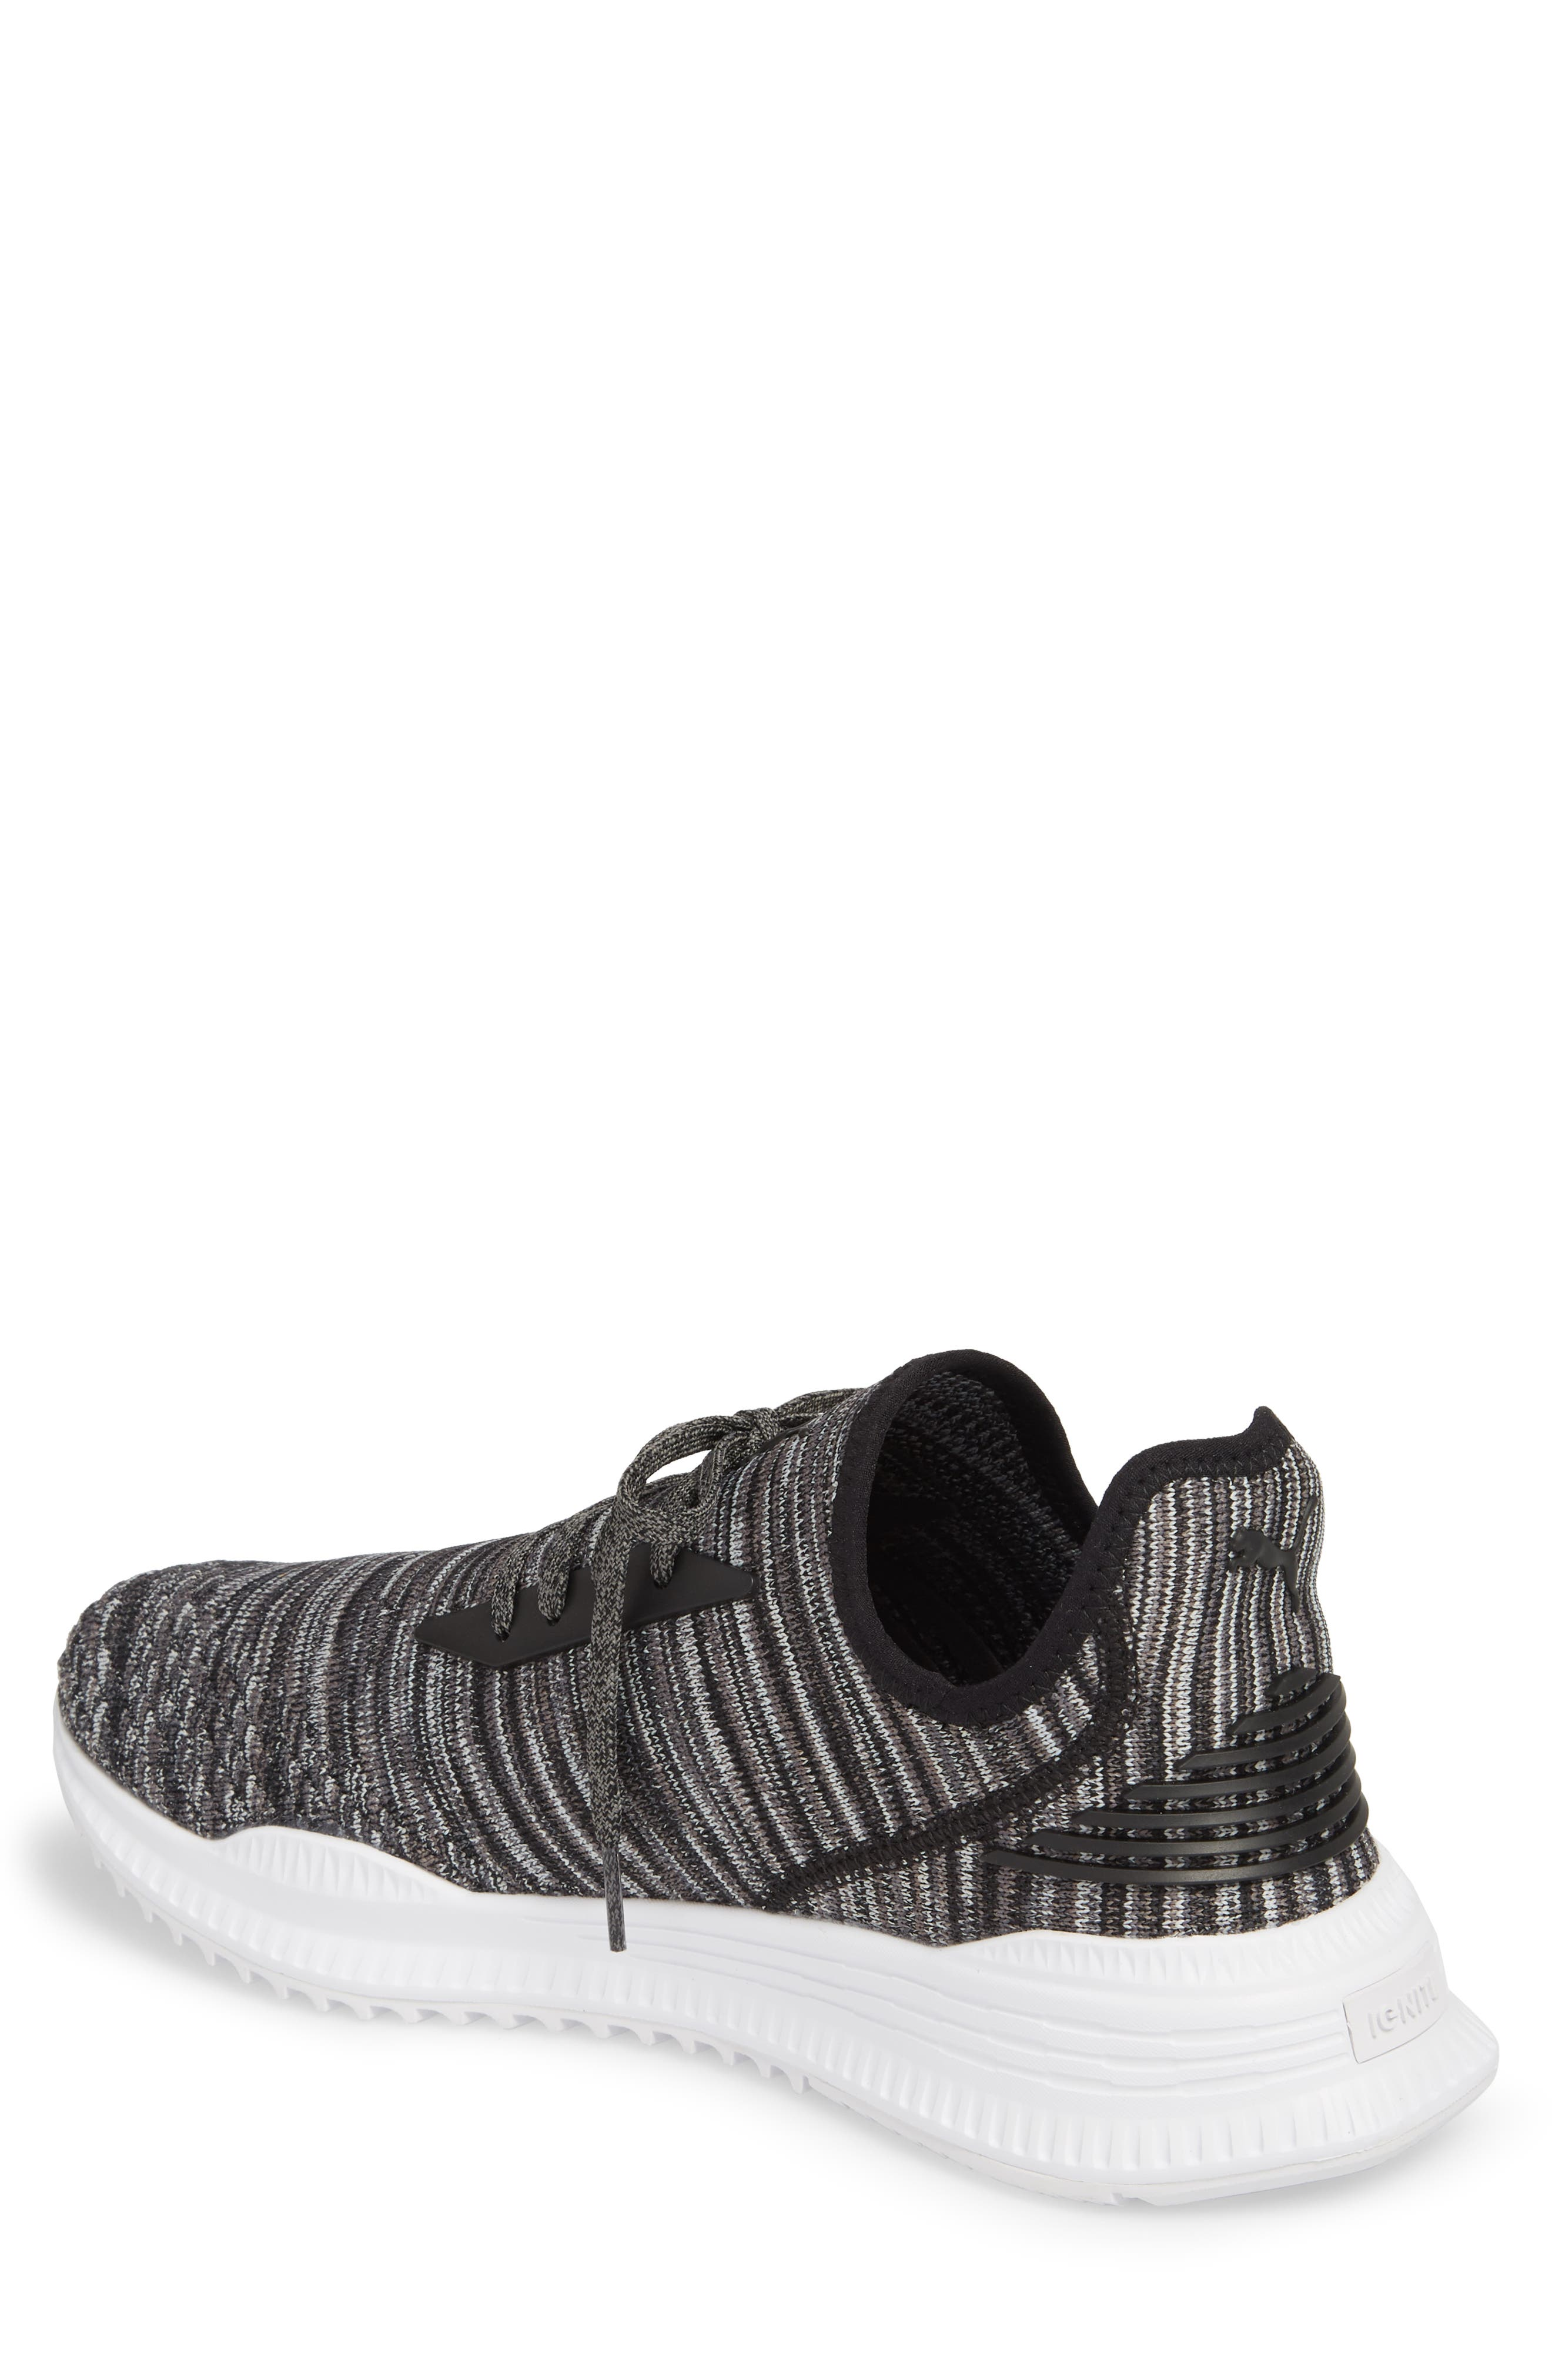 Tsugi 90 Sneaker,                             Alternate thumbnail 2, color,                             Black